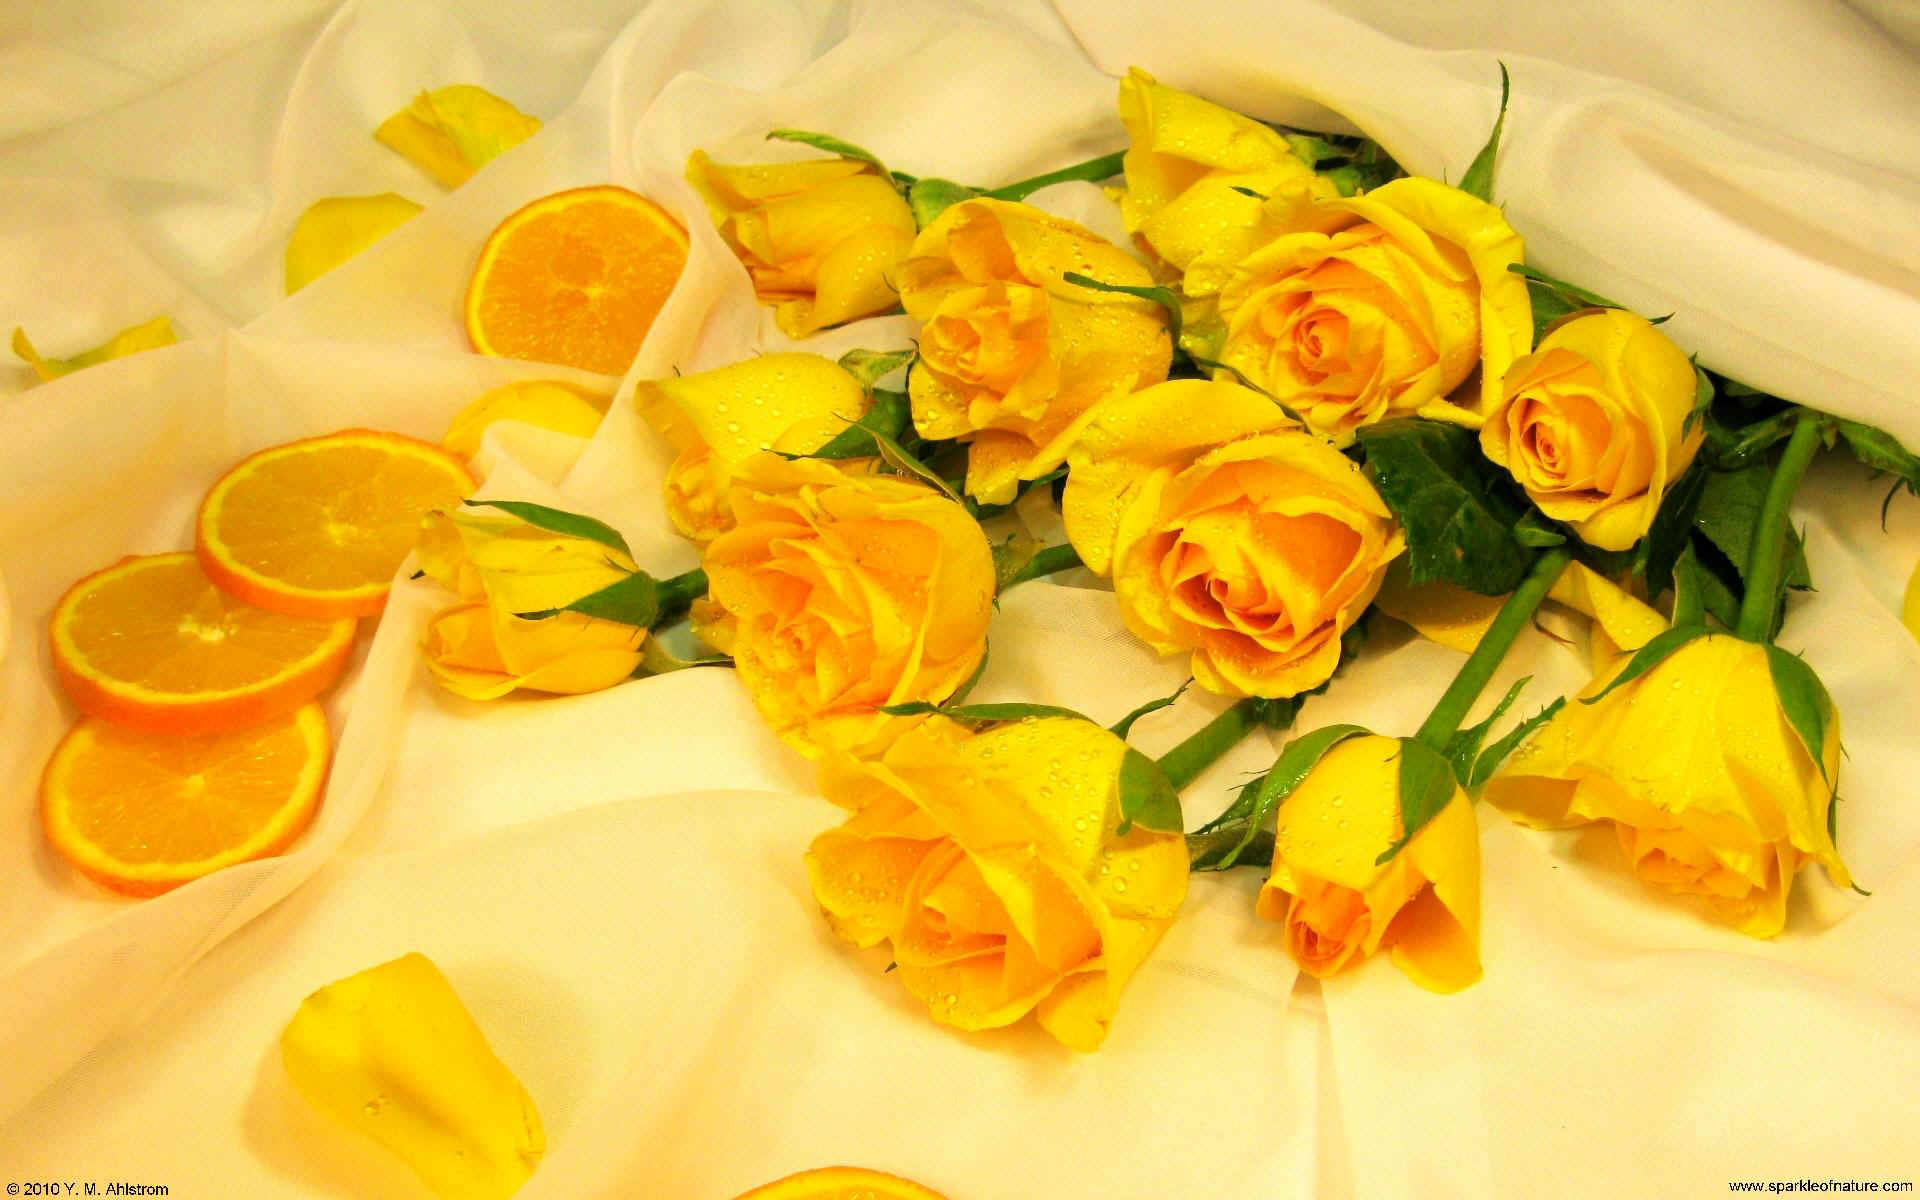 Hd wallpaper yellow rose - Wallpaper Sparkle Roses Yellow Oranges 1920x1200